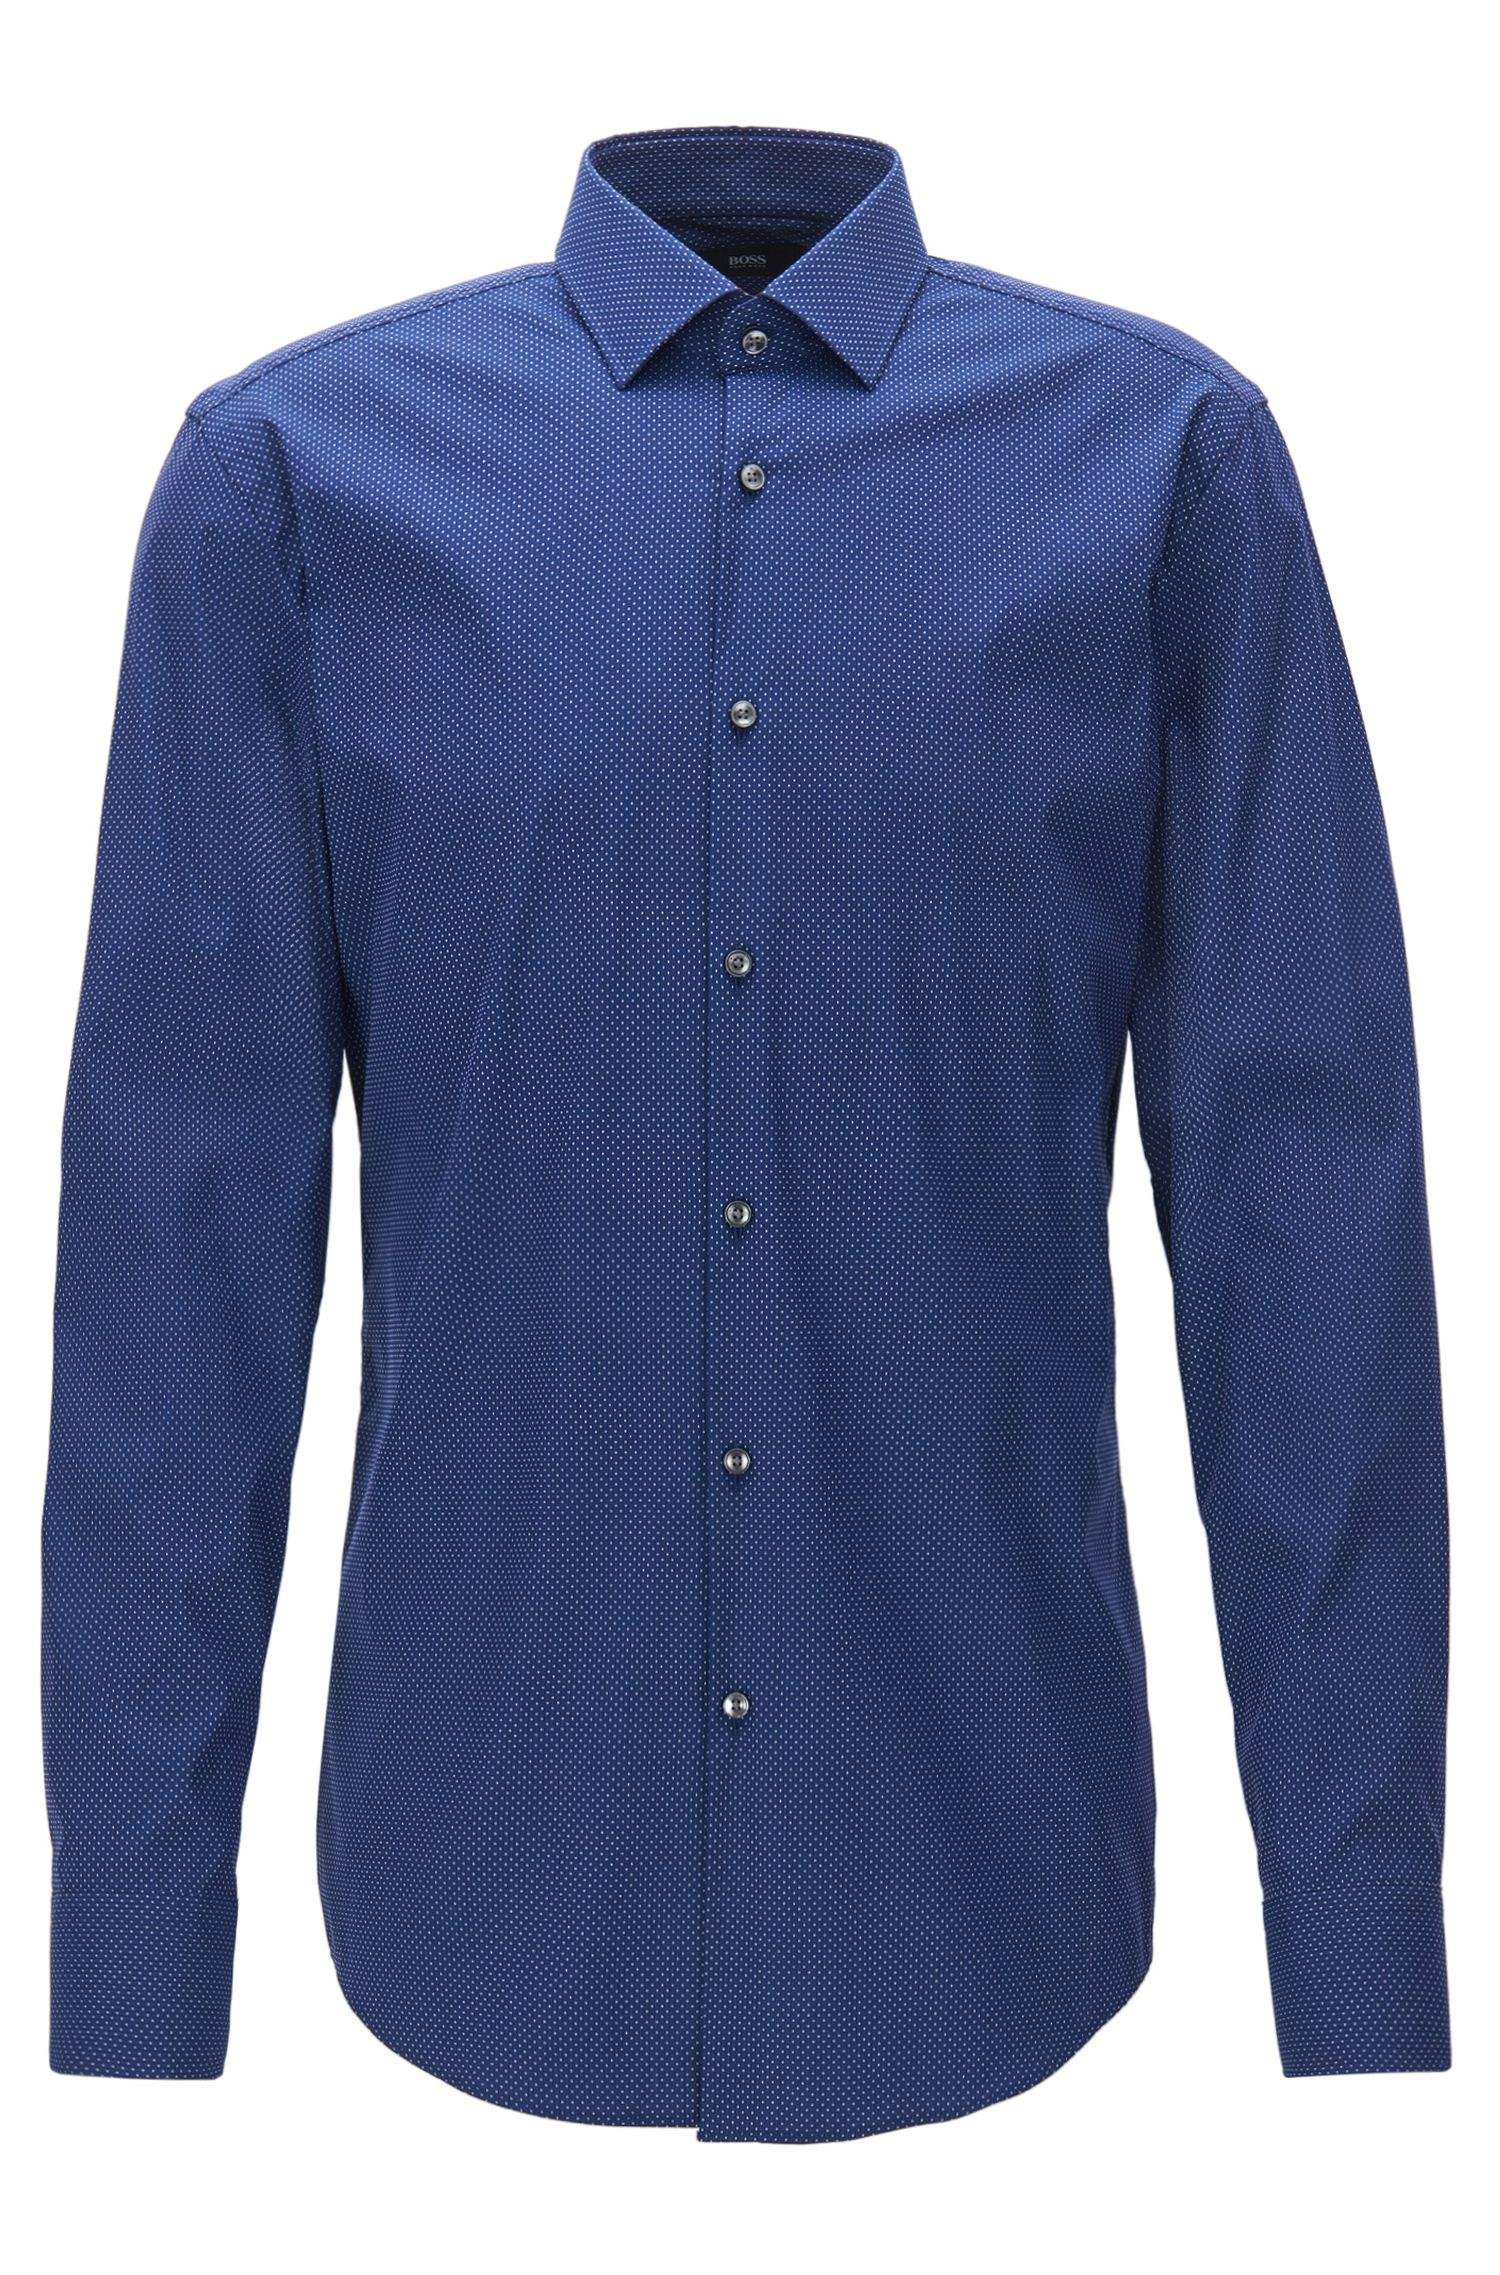 Slim-fit overhemd van gestructureerd stretchmateriaal